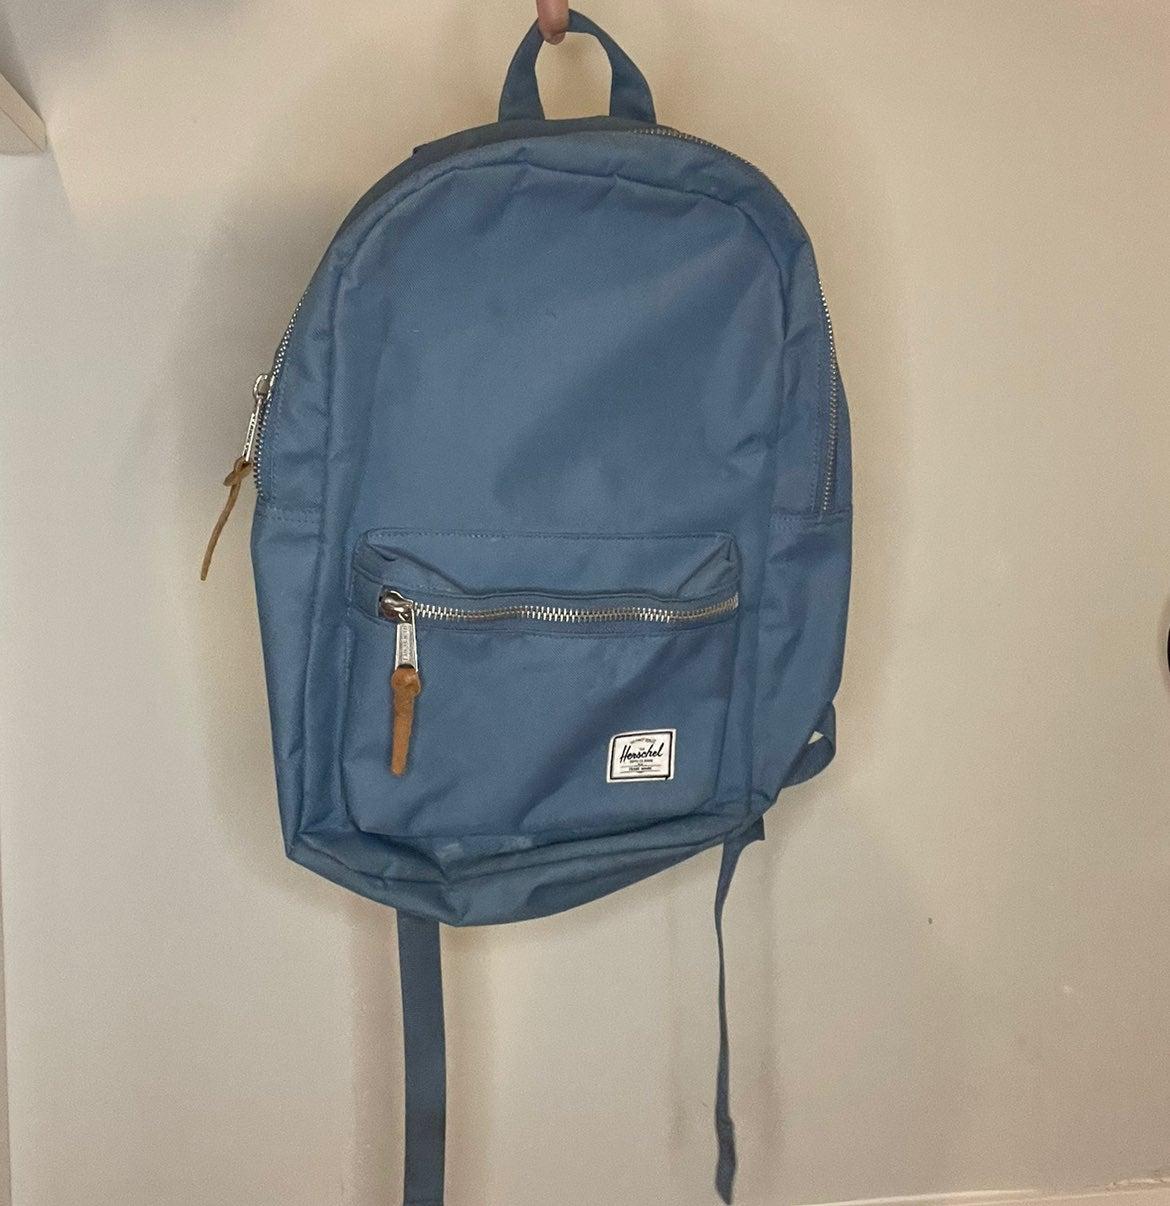 Herschel Bookbag